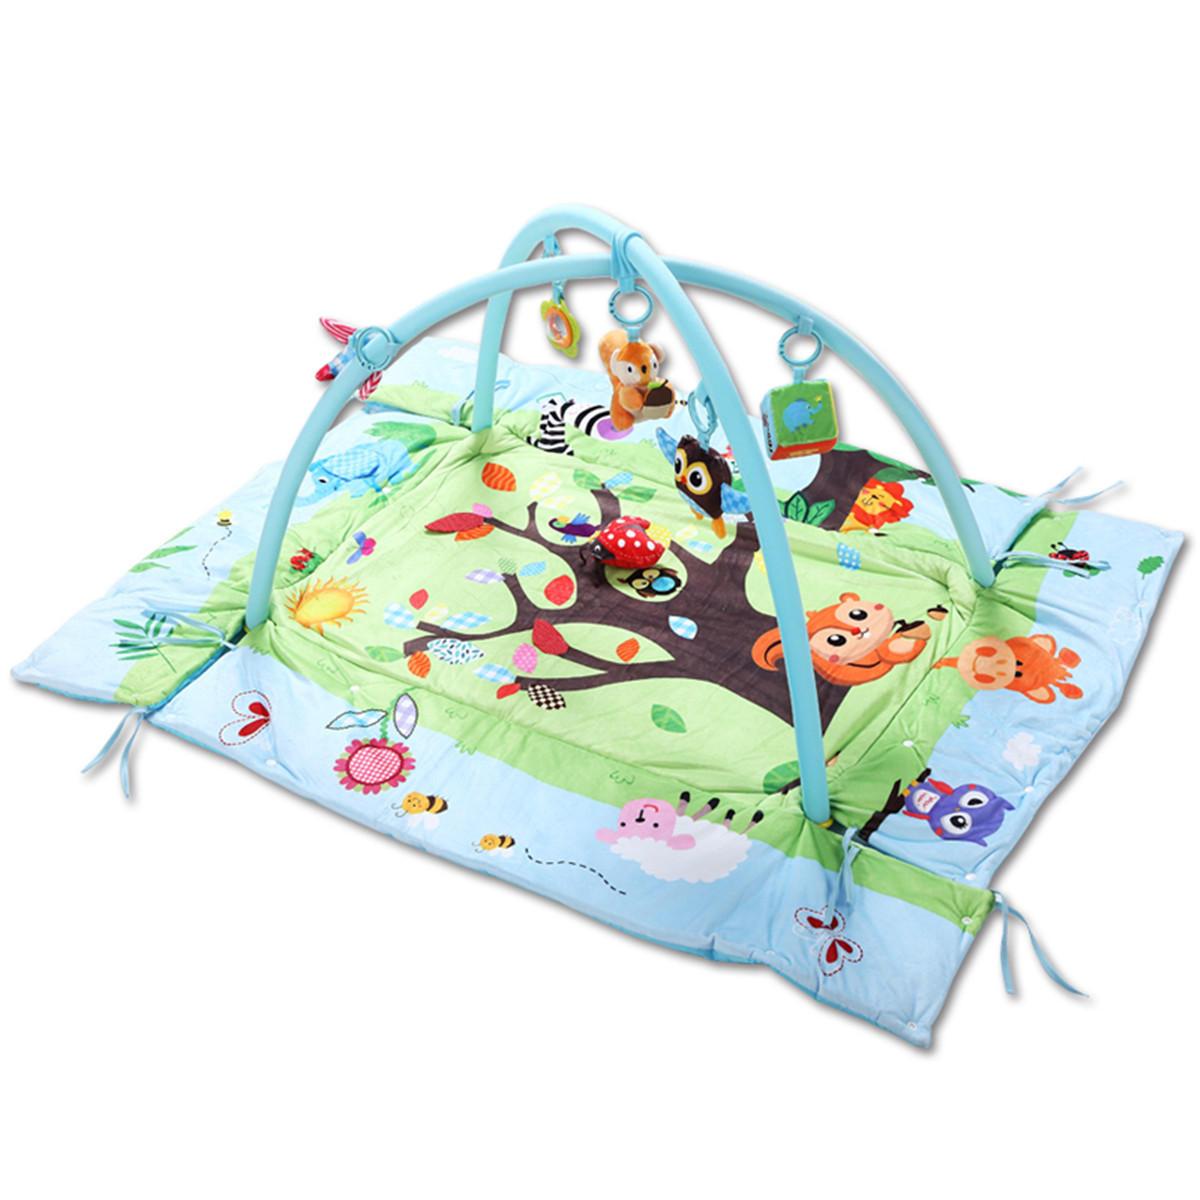 3 In 1 Baby Toys Mat Cartoon Soft Newborn Infant Kids Activity Gym Playspot Foam - 3